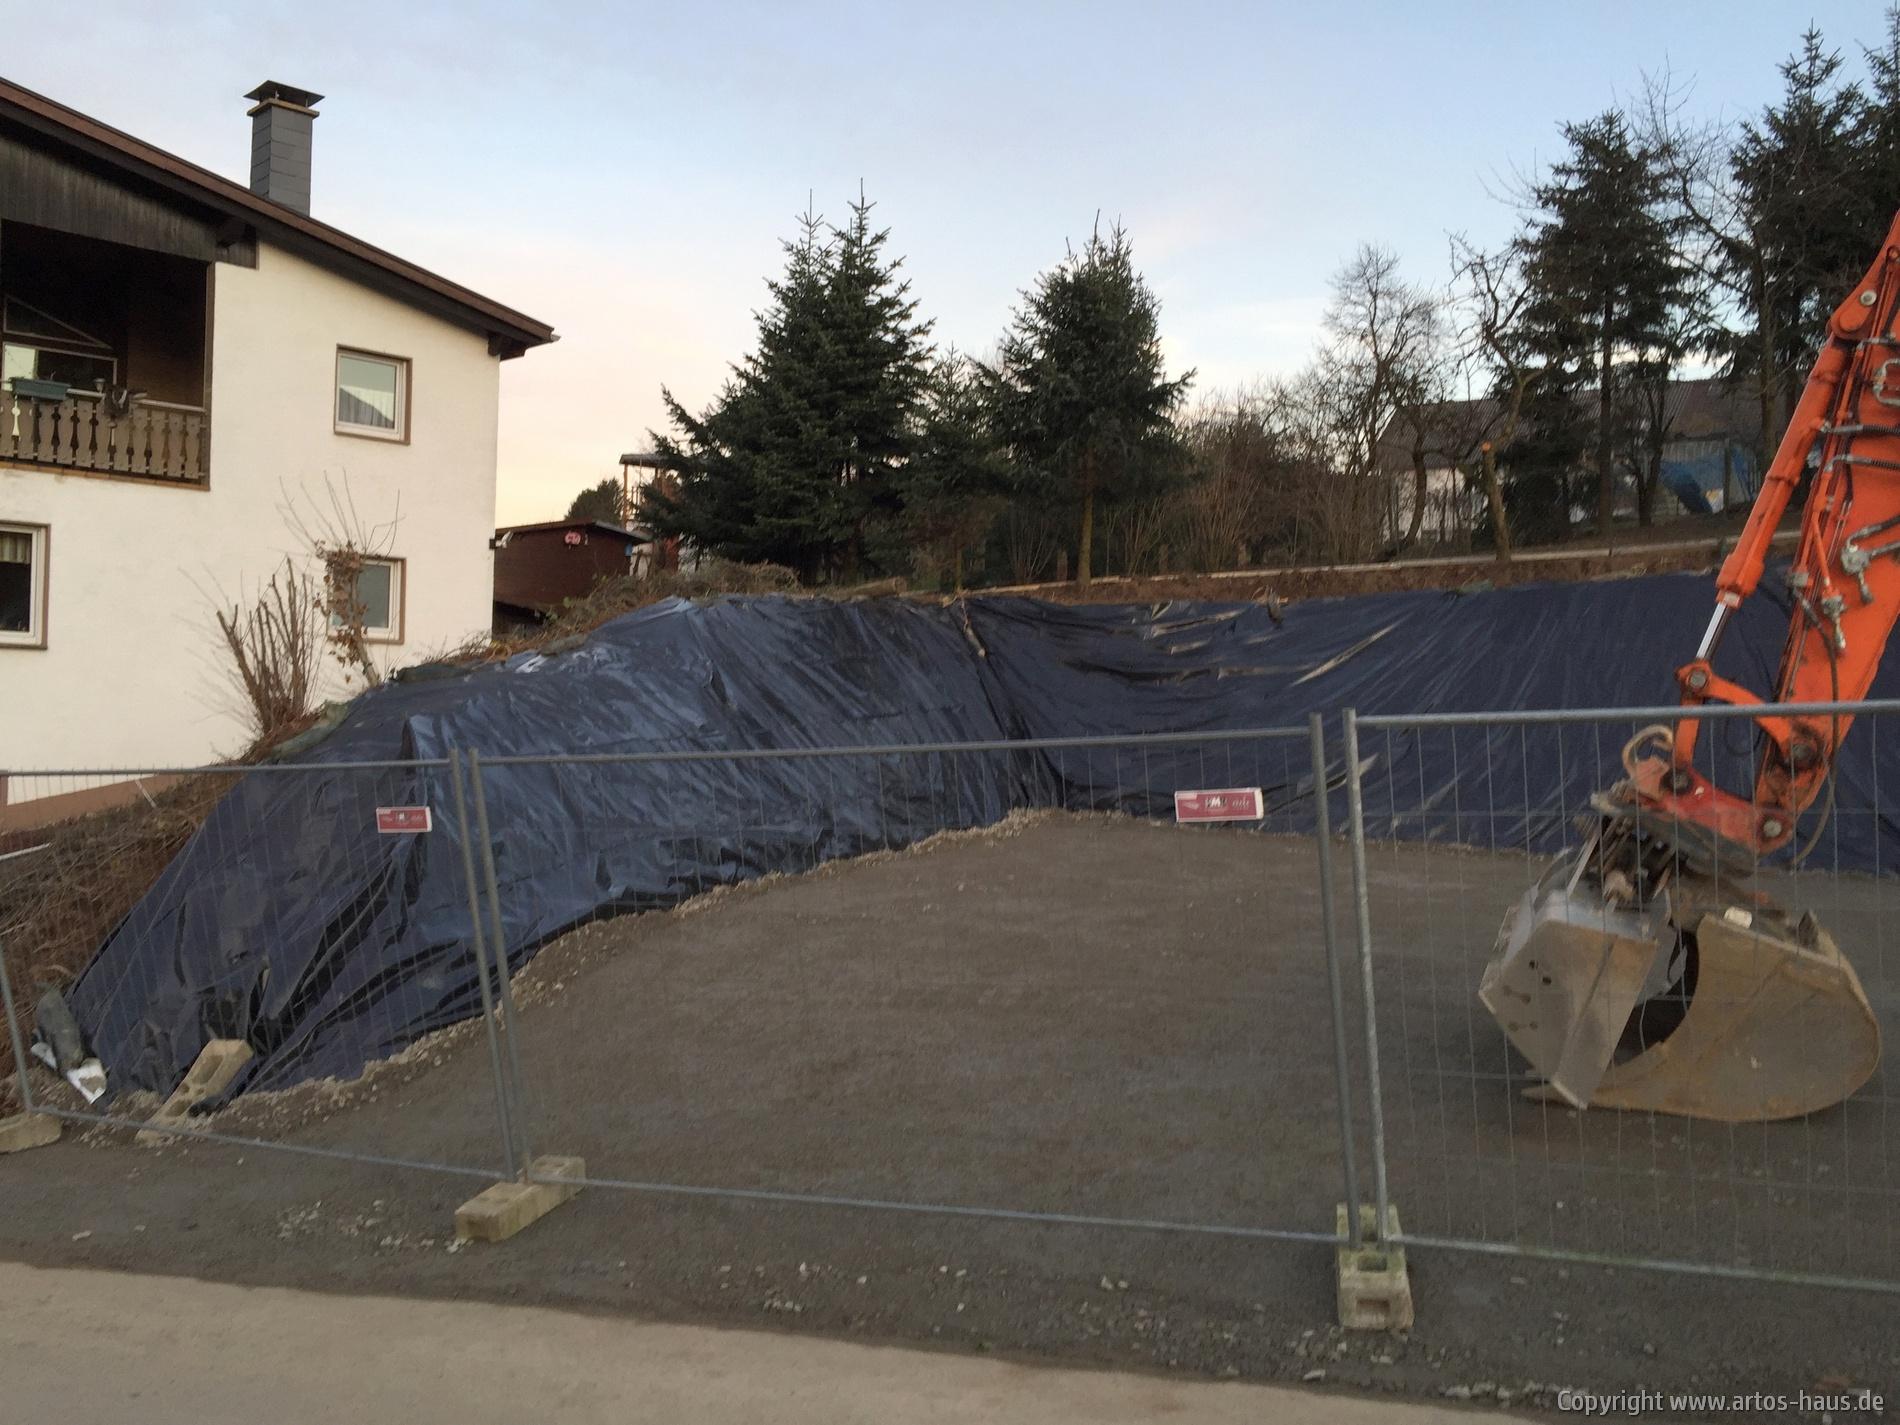 Baugrube fertiggestellt | Bild 2 artos-haus.de